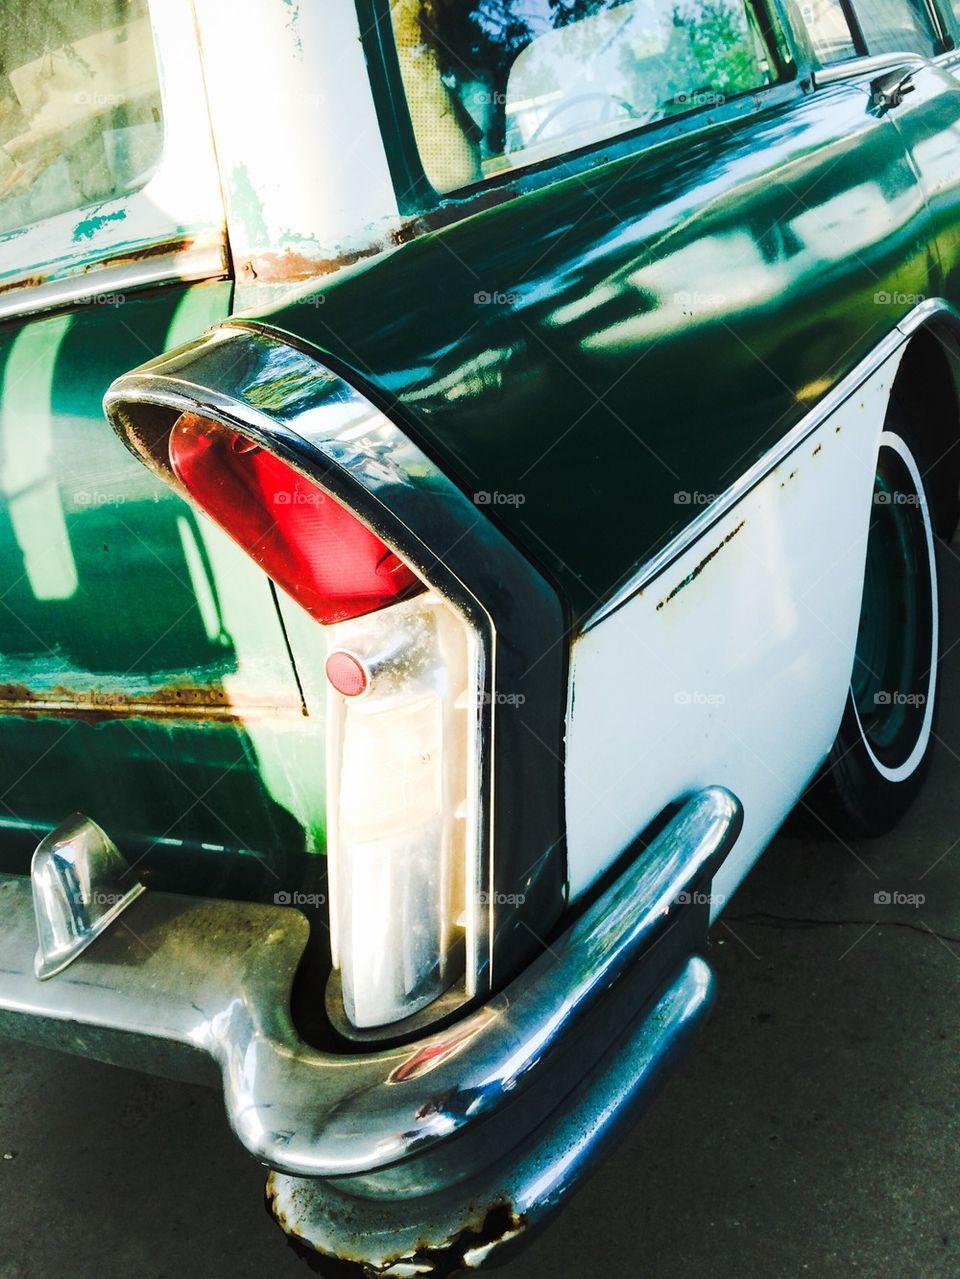 1956 Buick Century Wagon